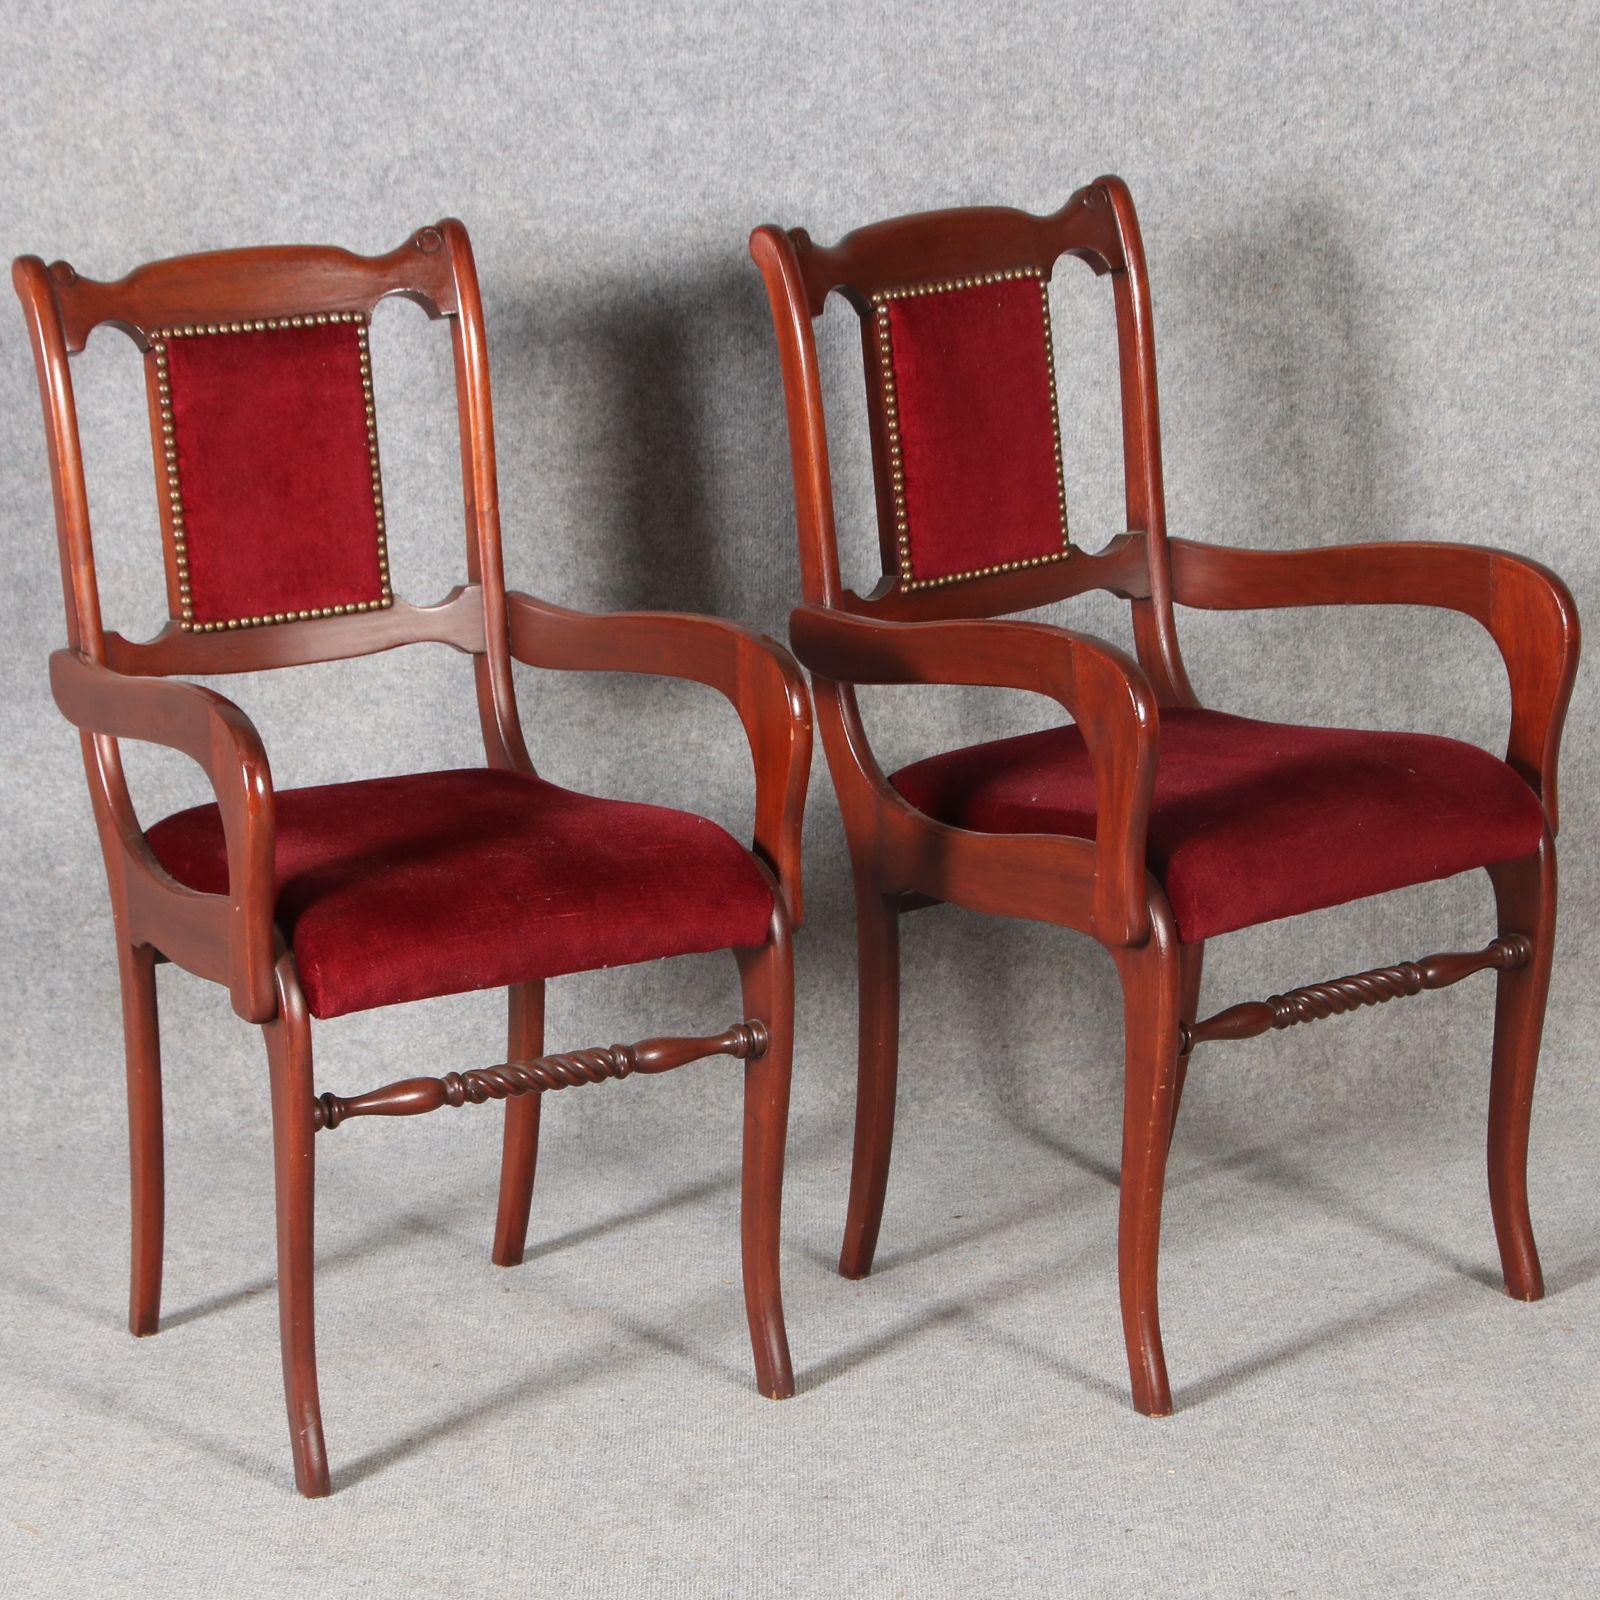 biedermeier sofa zu verkaufen council zwei armlehnstühle stil ebay